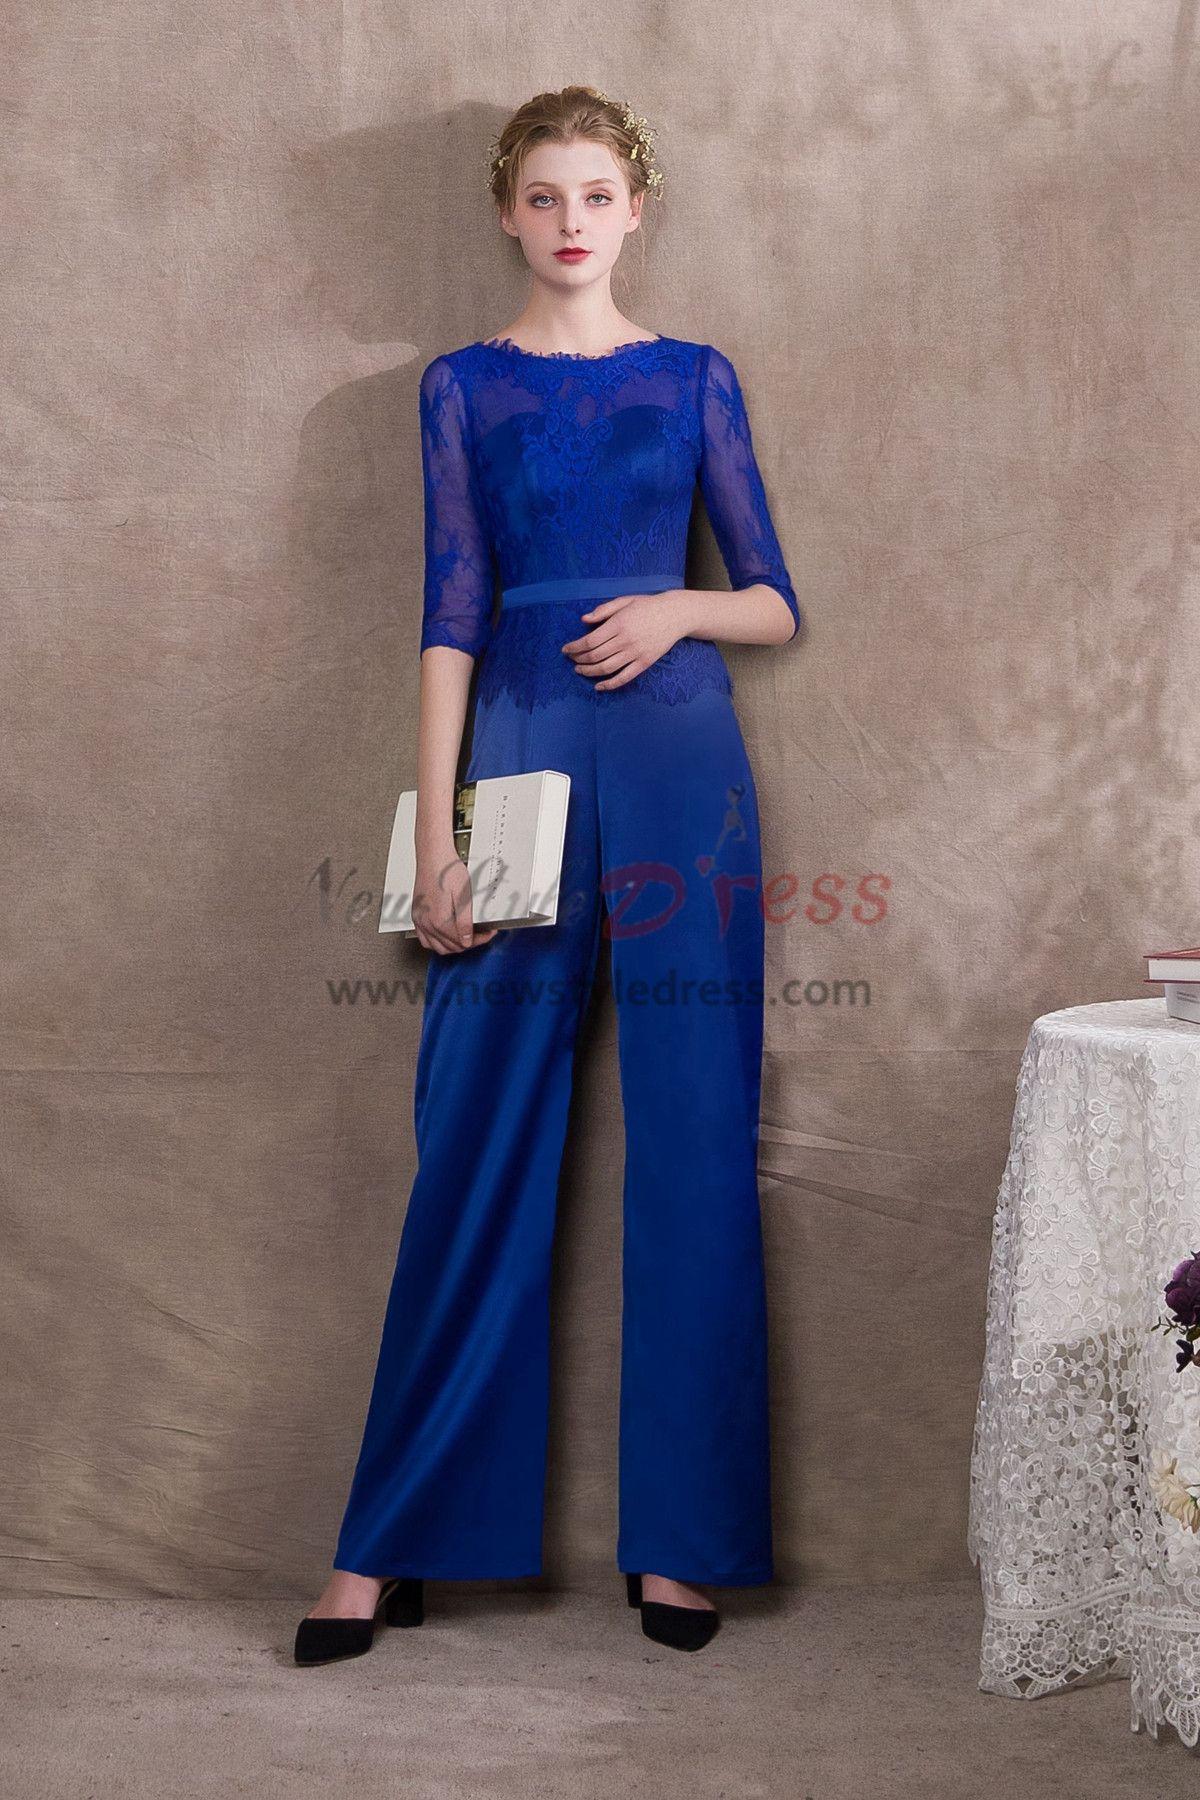 2ebc7673fcd2 Modern Royal Blue Prom dresses Jumpsuits Free Shipping NP-0395 ...